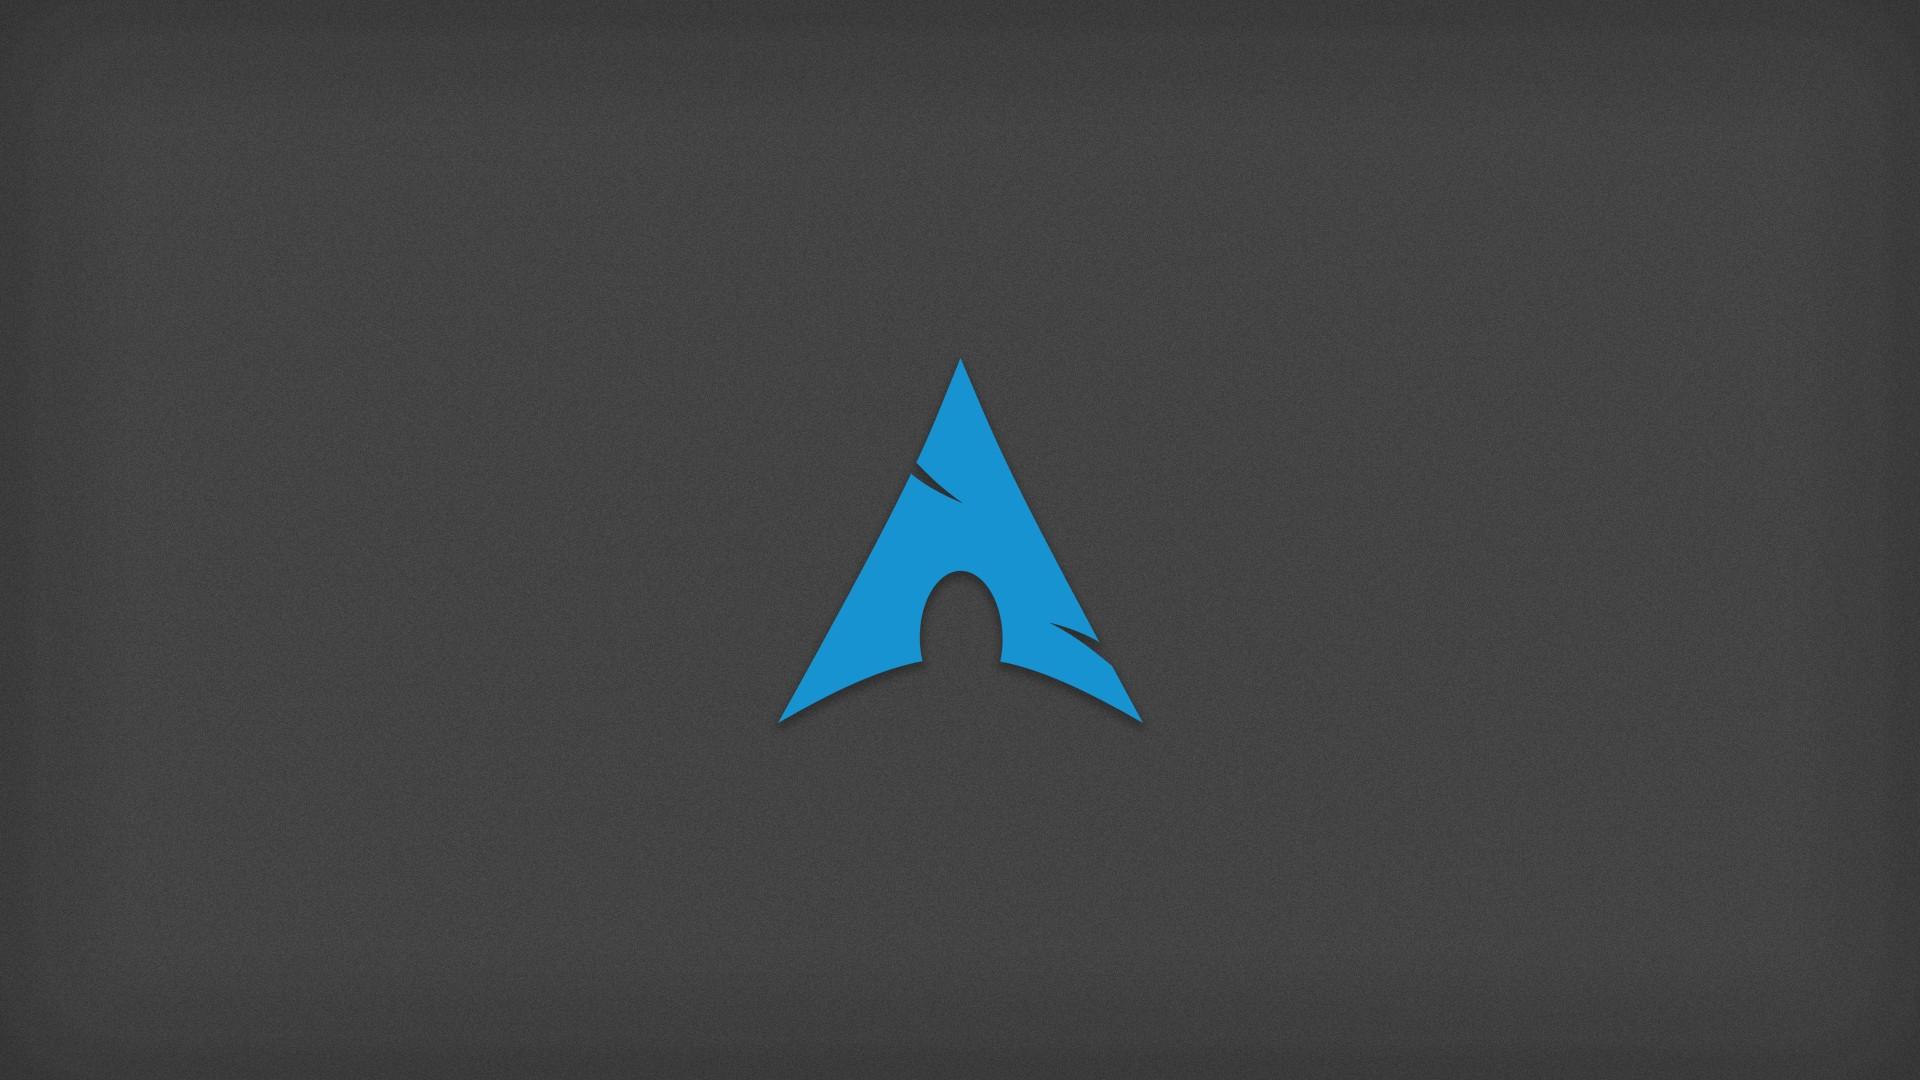 1920x1080 Px Arch Linux Triangle